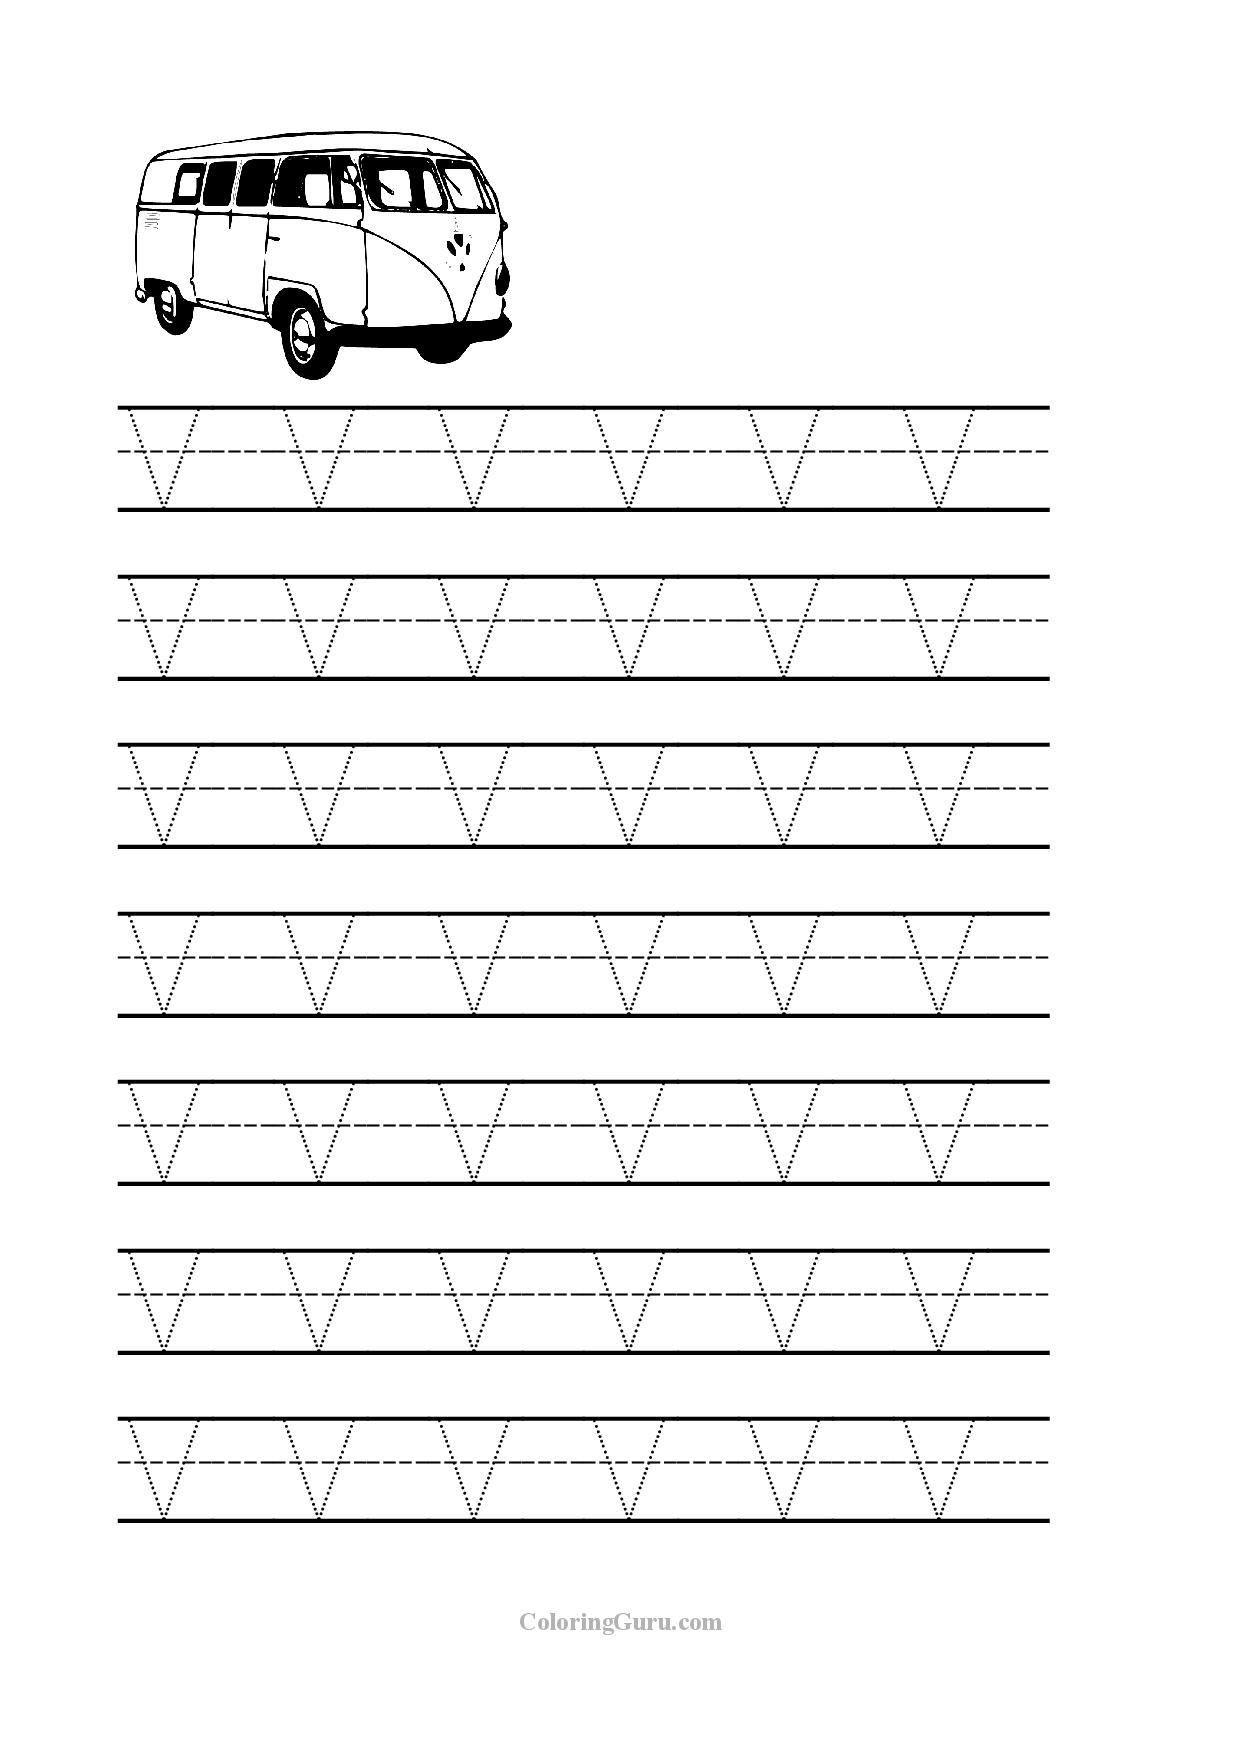 5 Letter E Writing Practice Worksheet Printable In